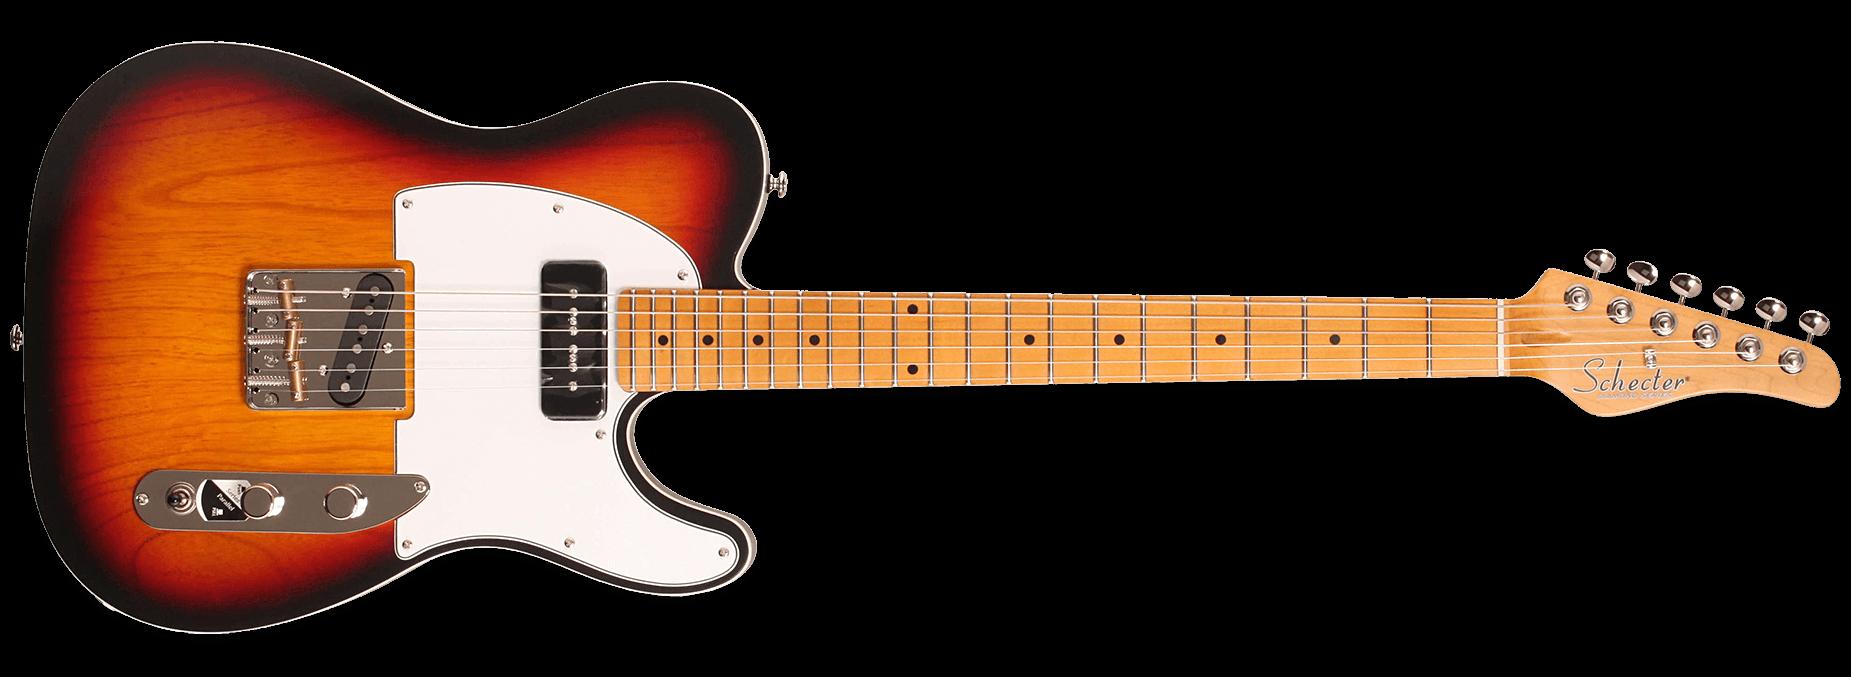 Schecter PT Special 3-Tone Sunburst